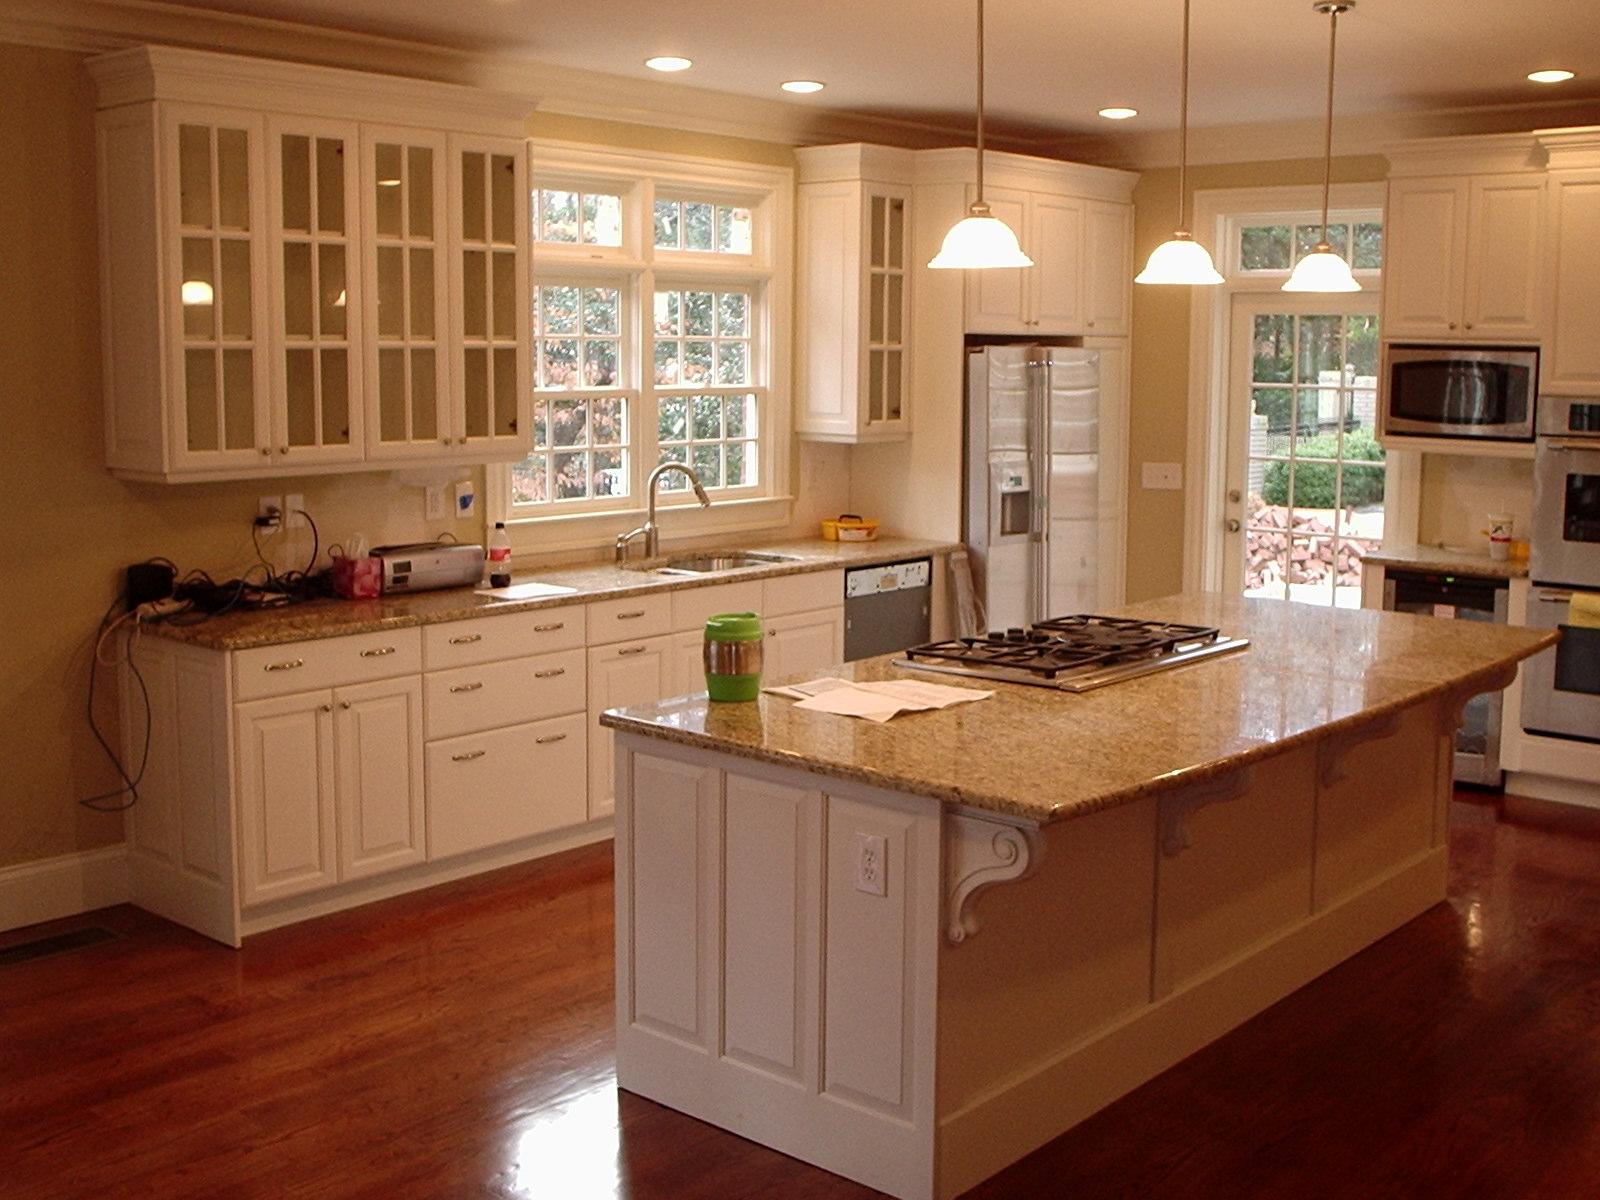 Brown kitchen appliances Photo - 1